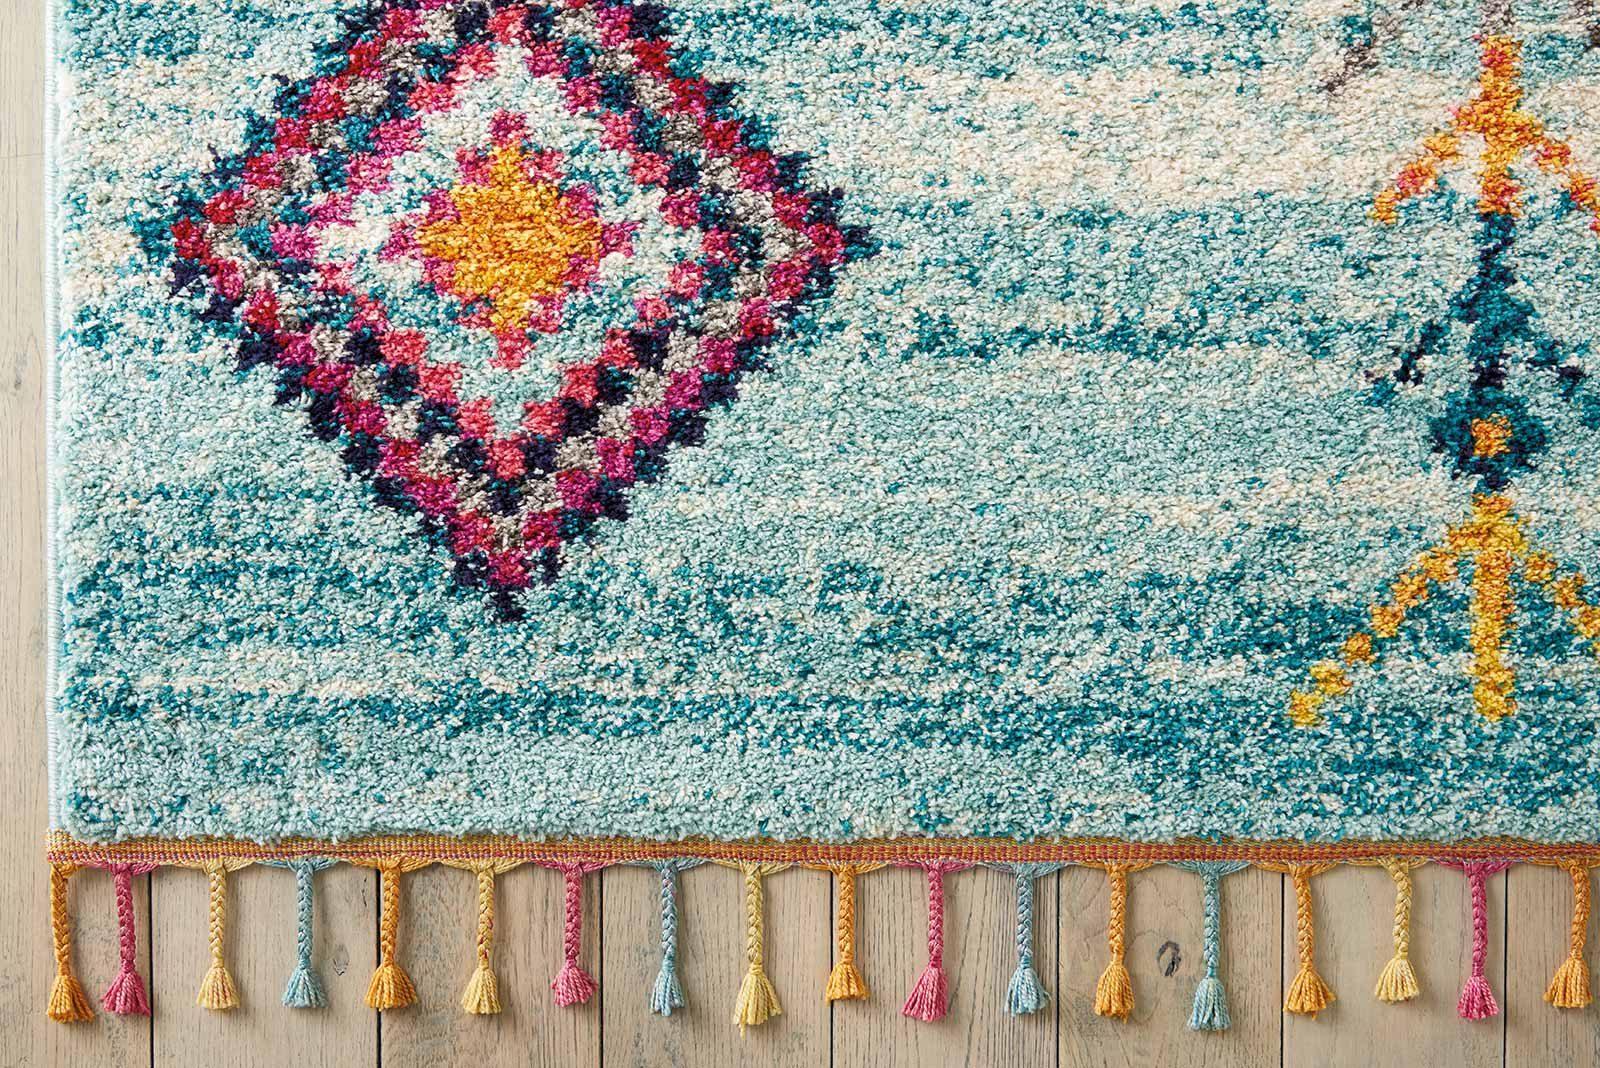 Andessi tapijt Nomad NMD04 AQUA 5x8 099446461490 CR01